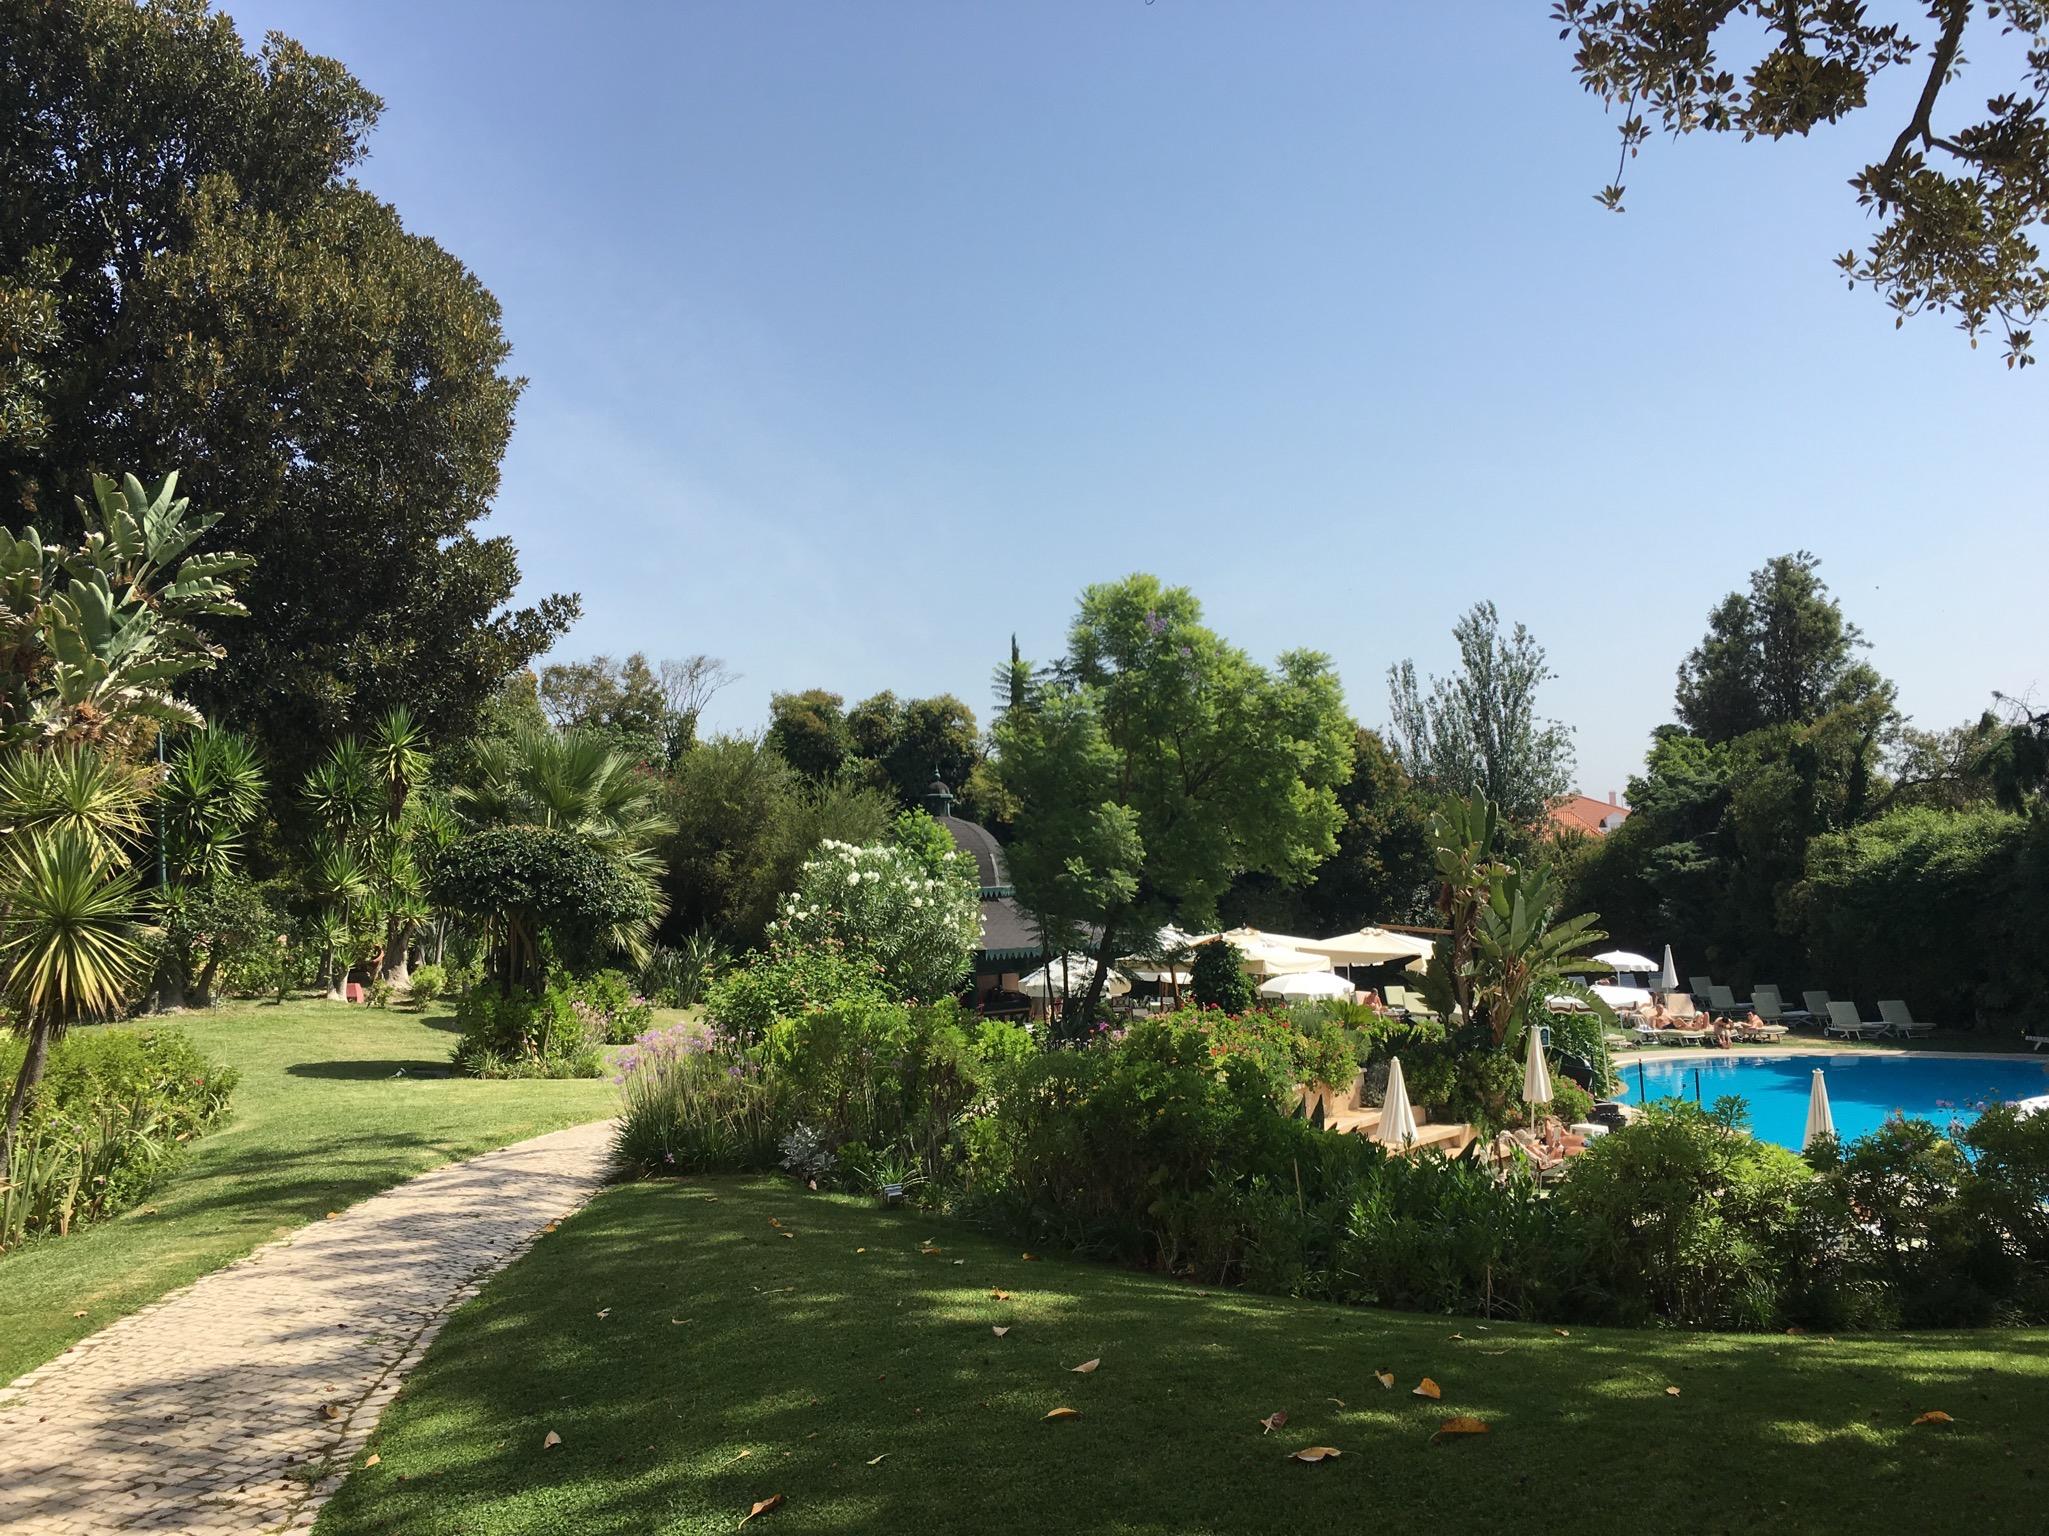 Olissippo Lapa Palace Pool entrance